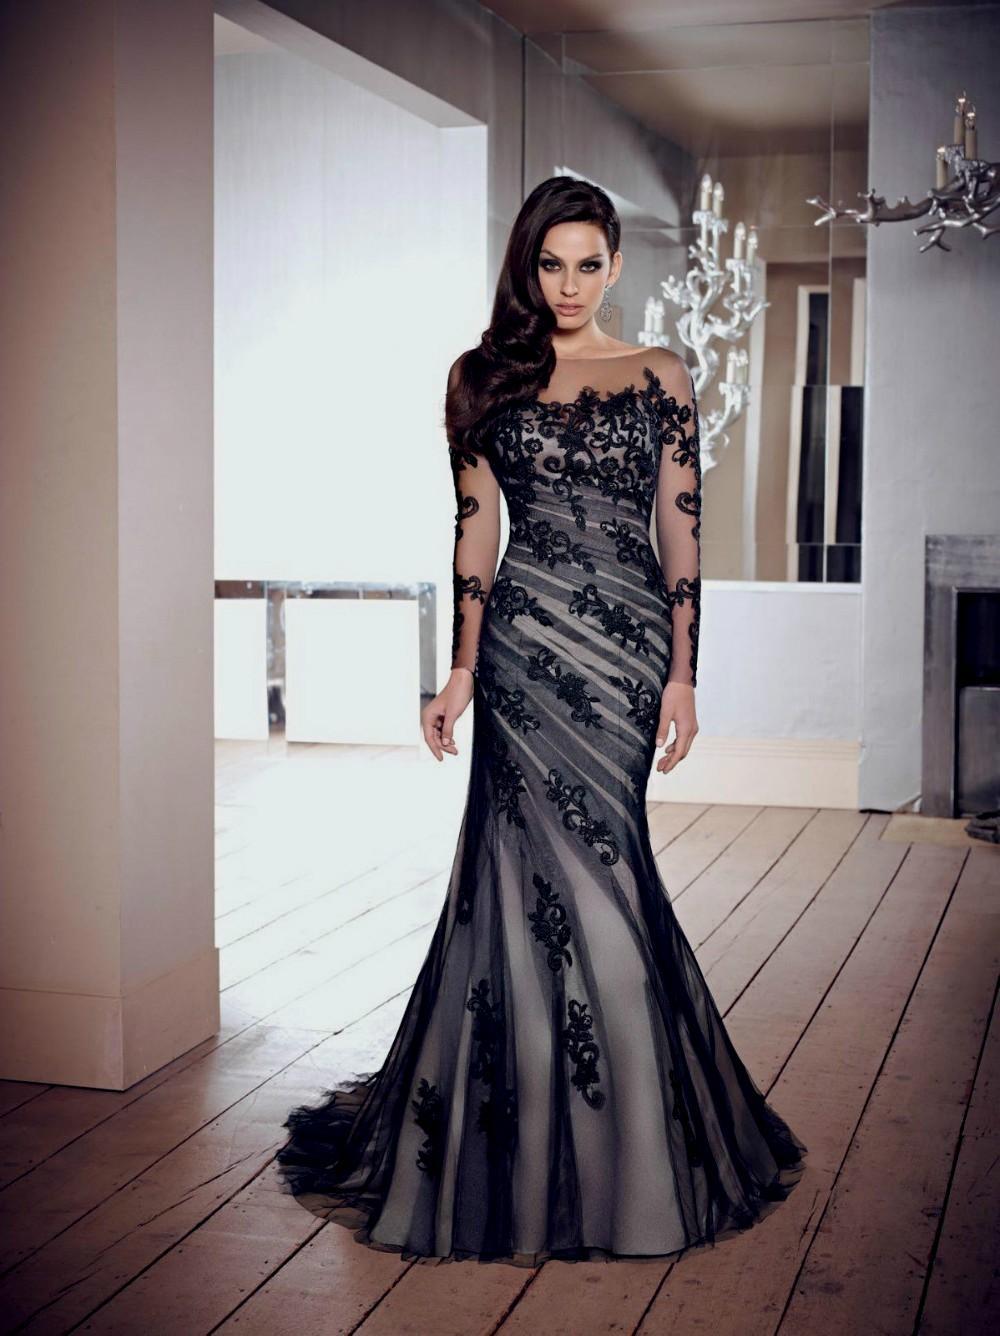 black wedding dresses black lace wedding dress with sleeves . UAXBYZD